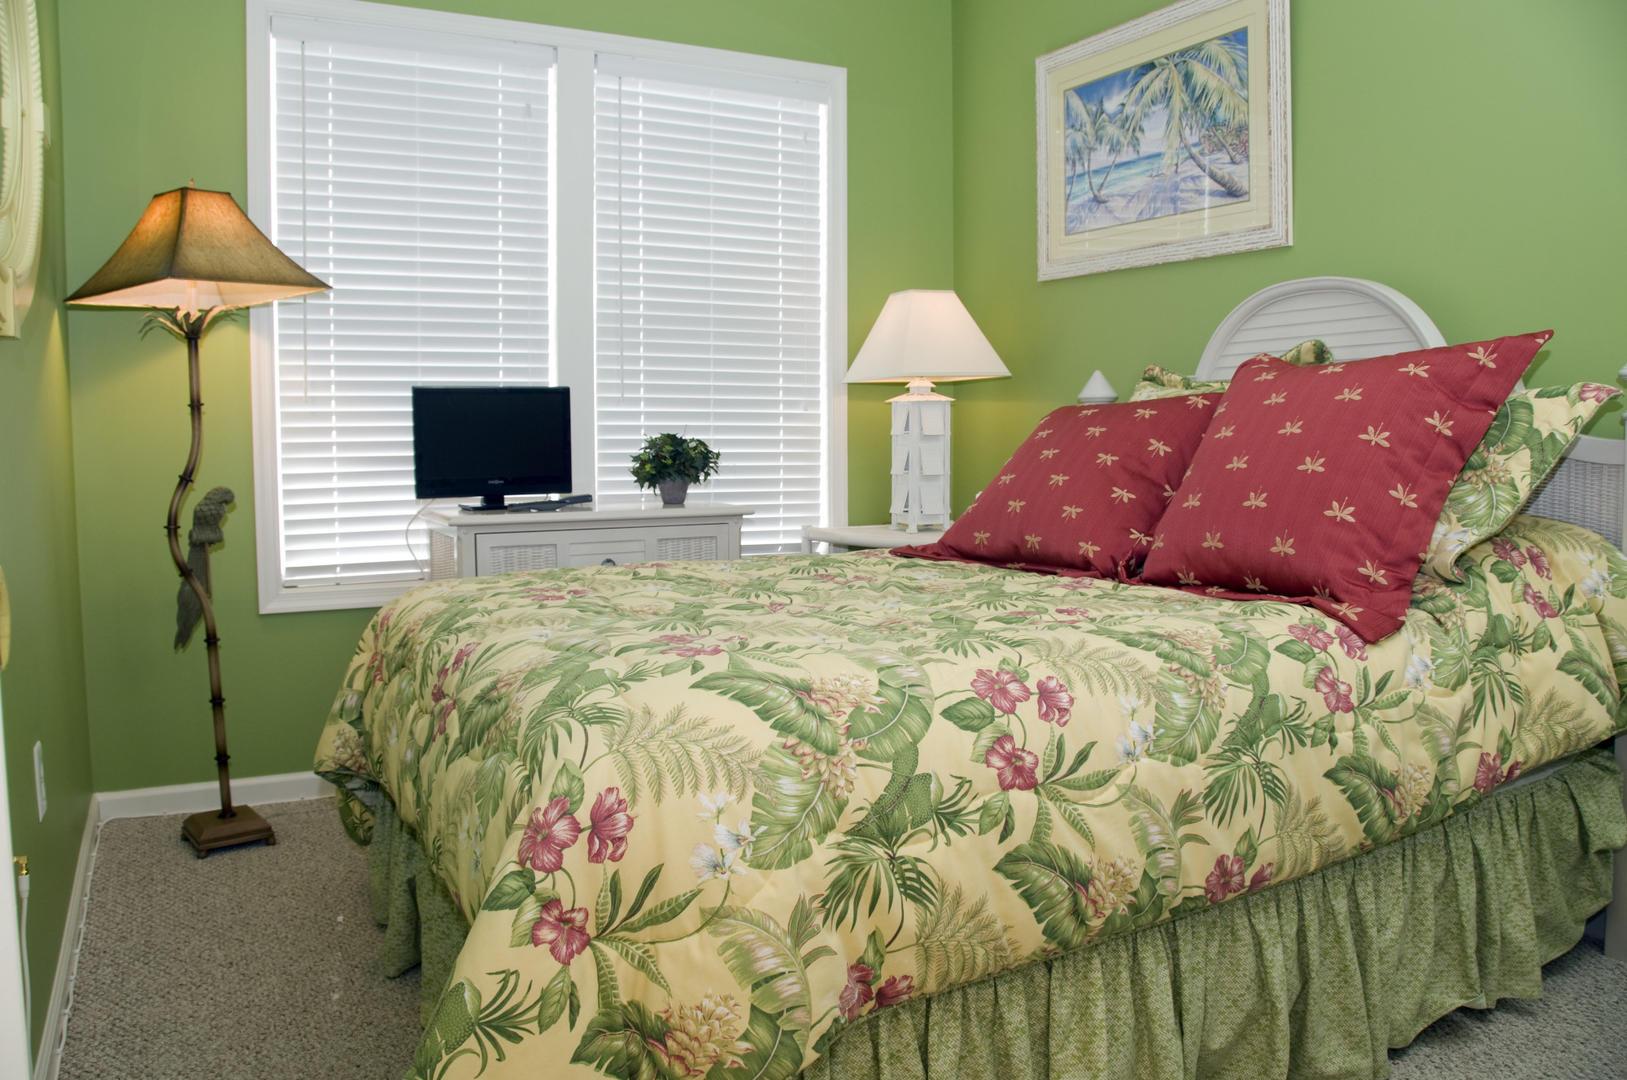 Sunset Island 47 Island Edge Dr. - Bedroom 2